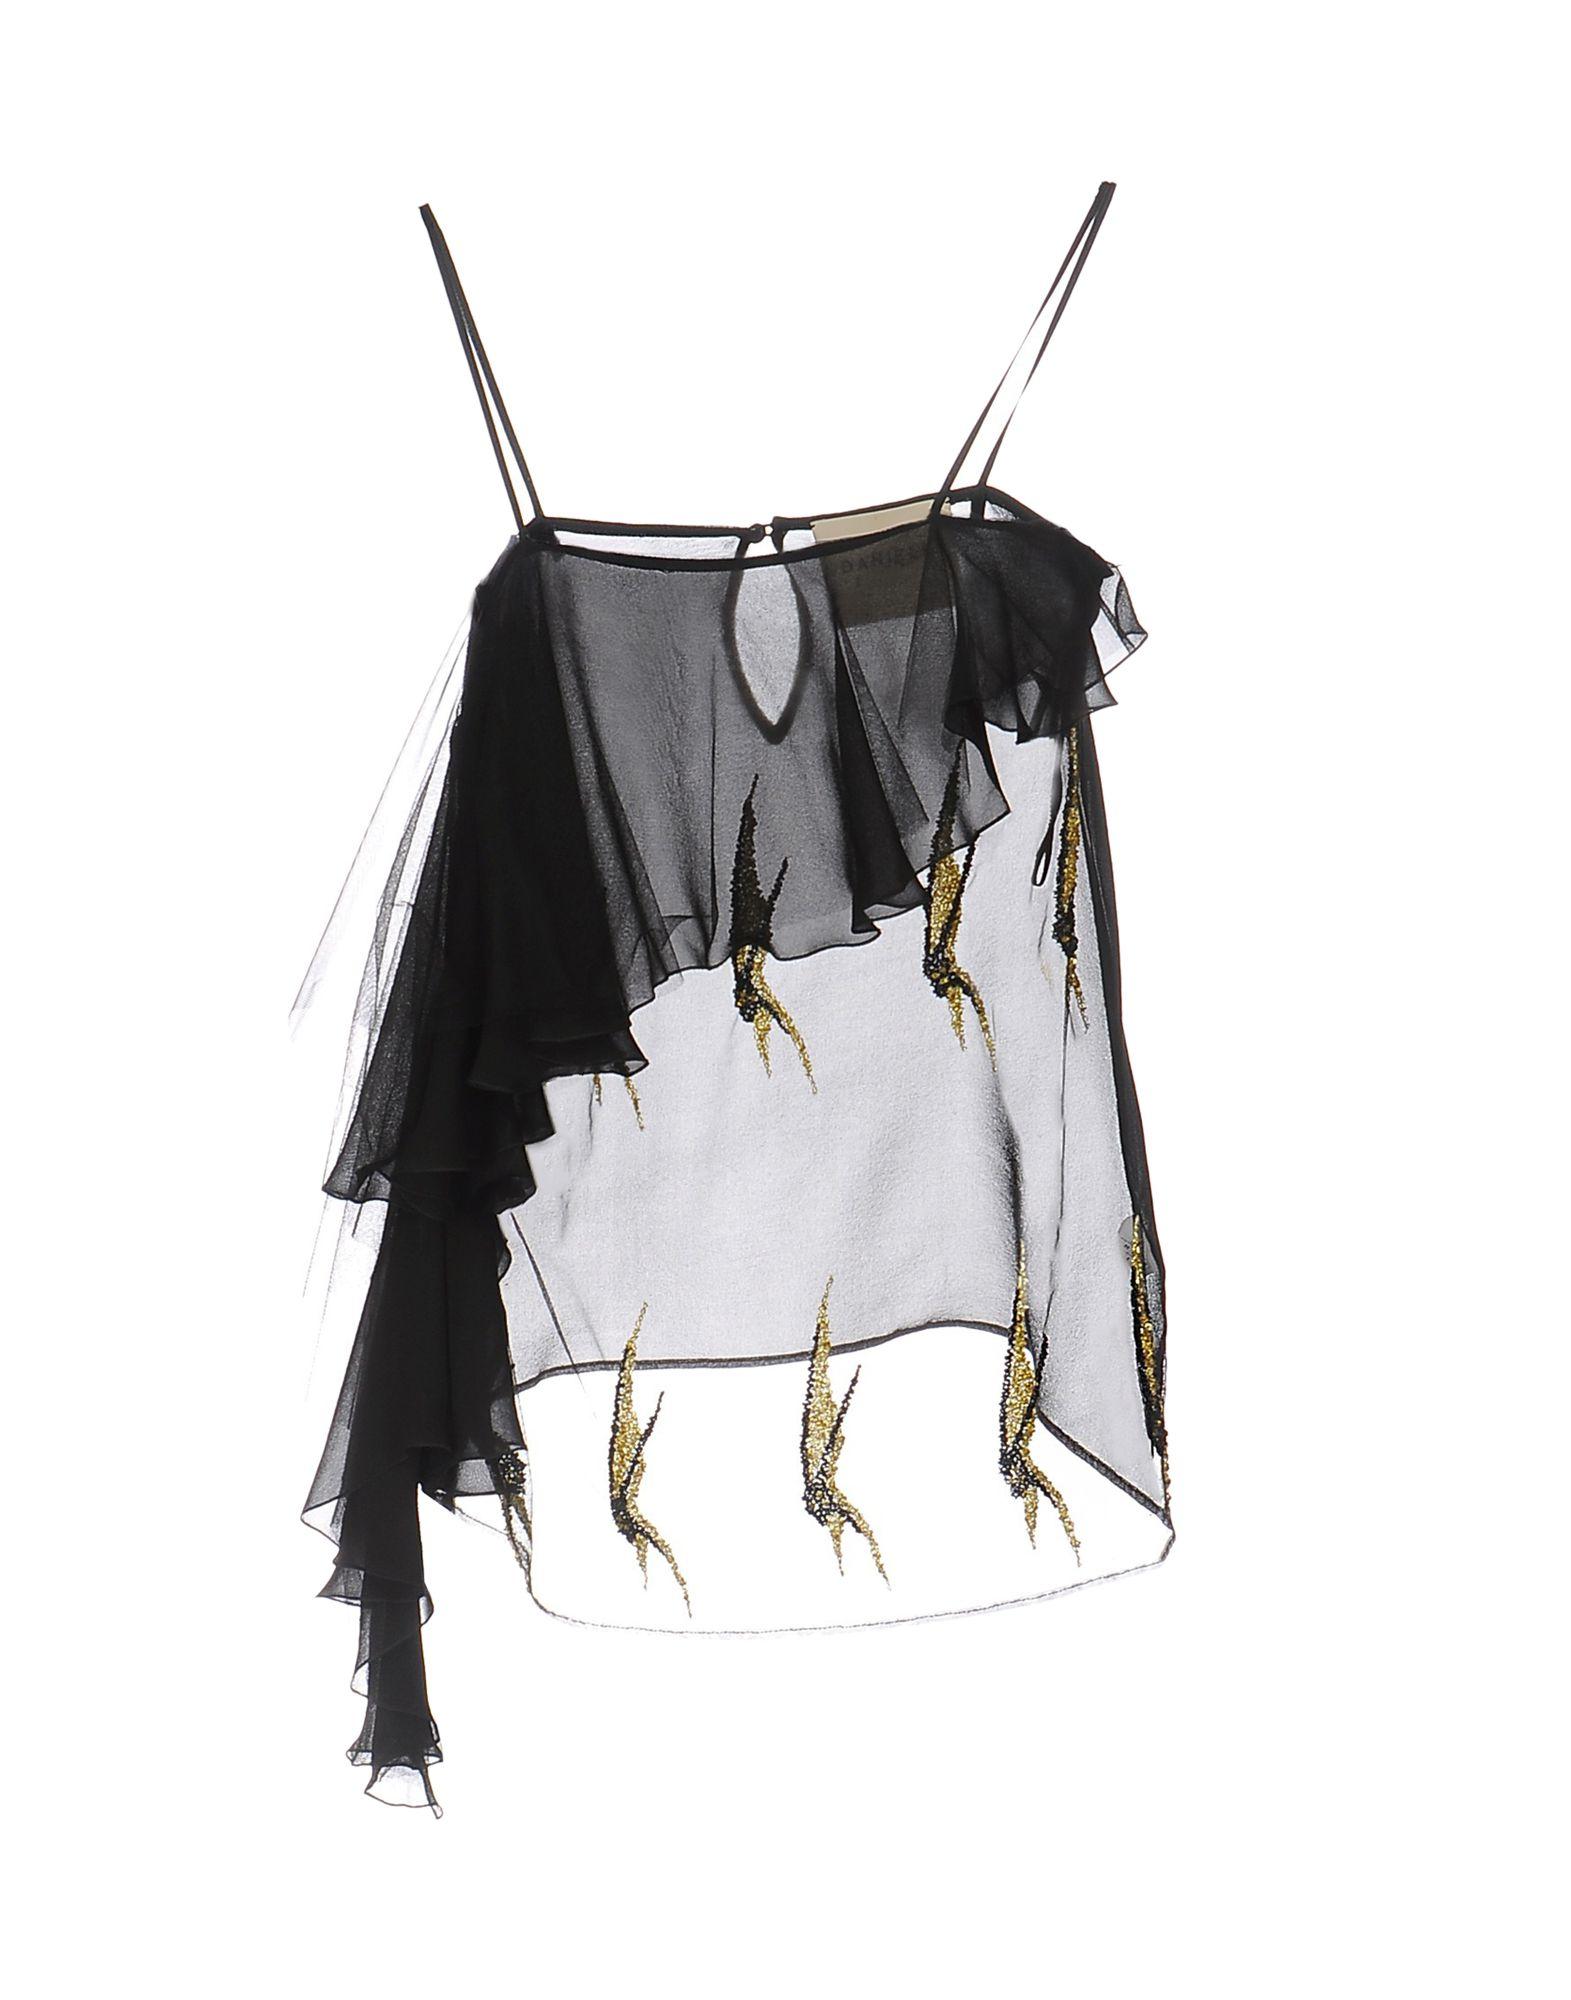 Buys Ligne Femme En Daniele CarlottaSur Top byIgvY76mf